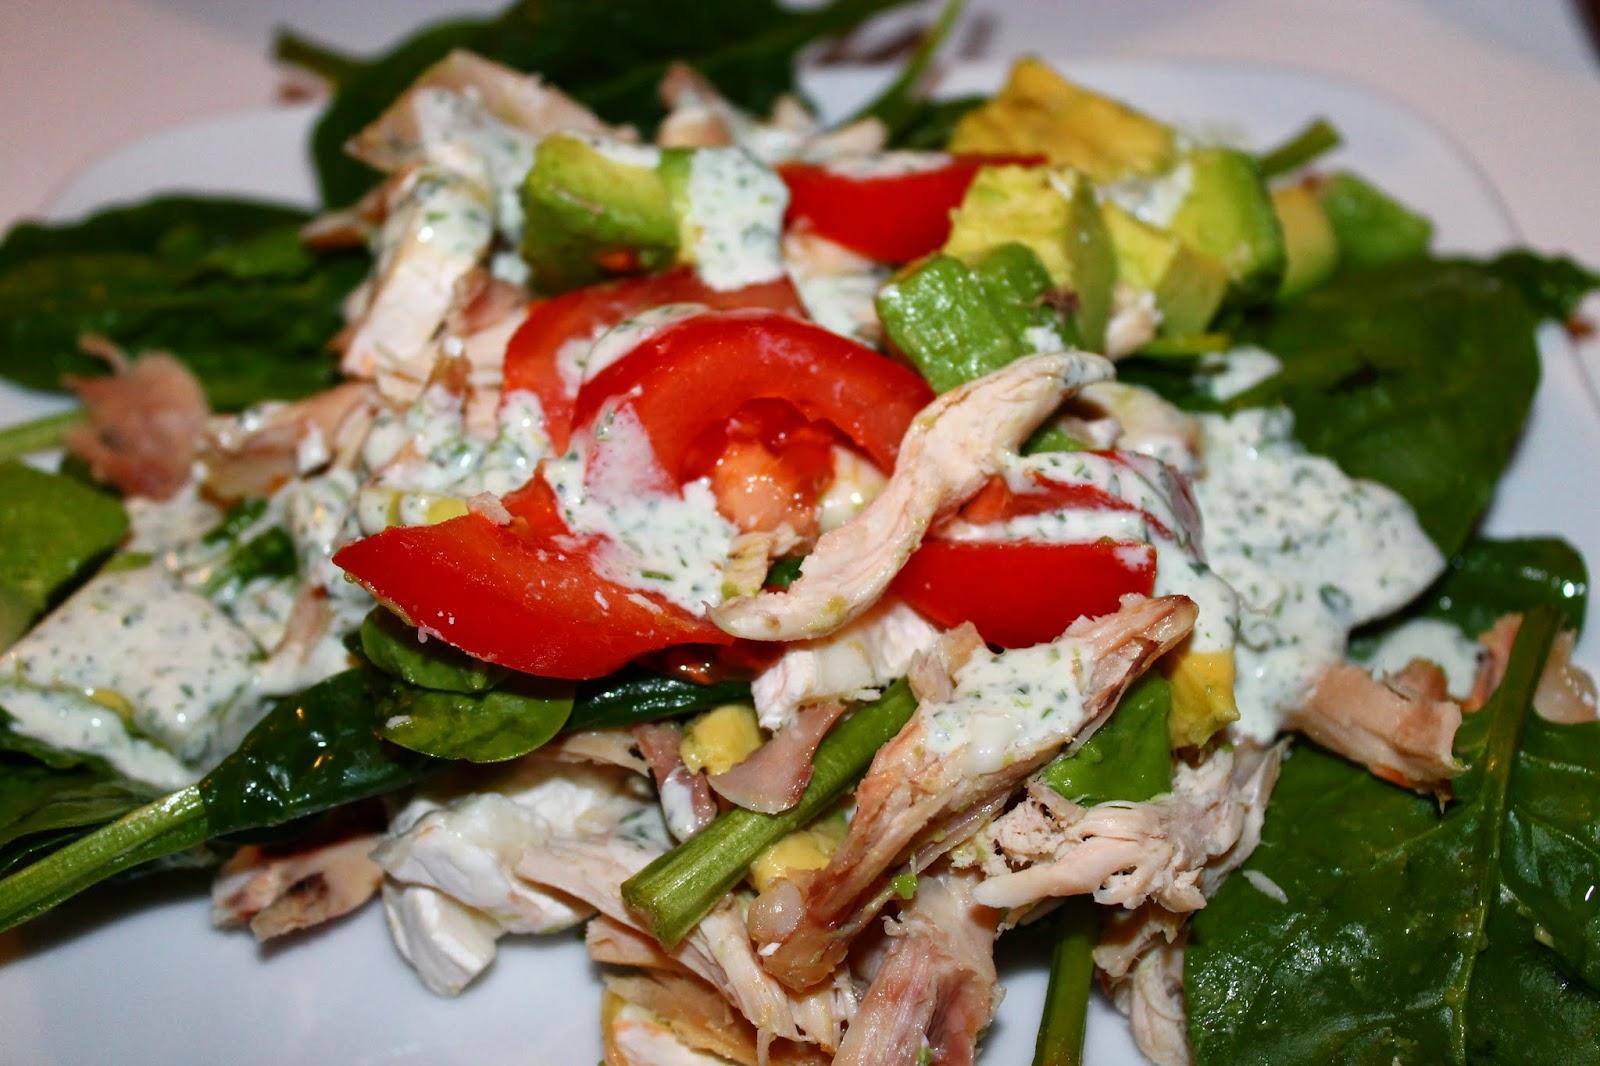 salade de poulet sauce yaourt